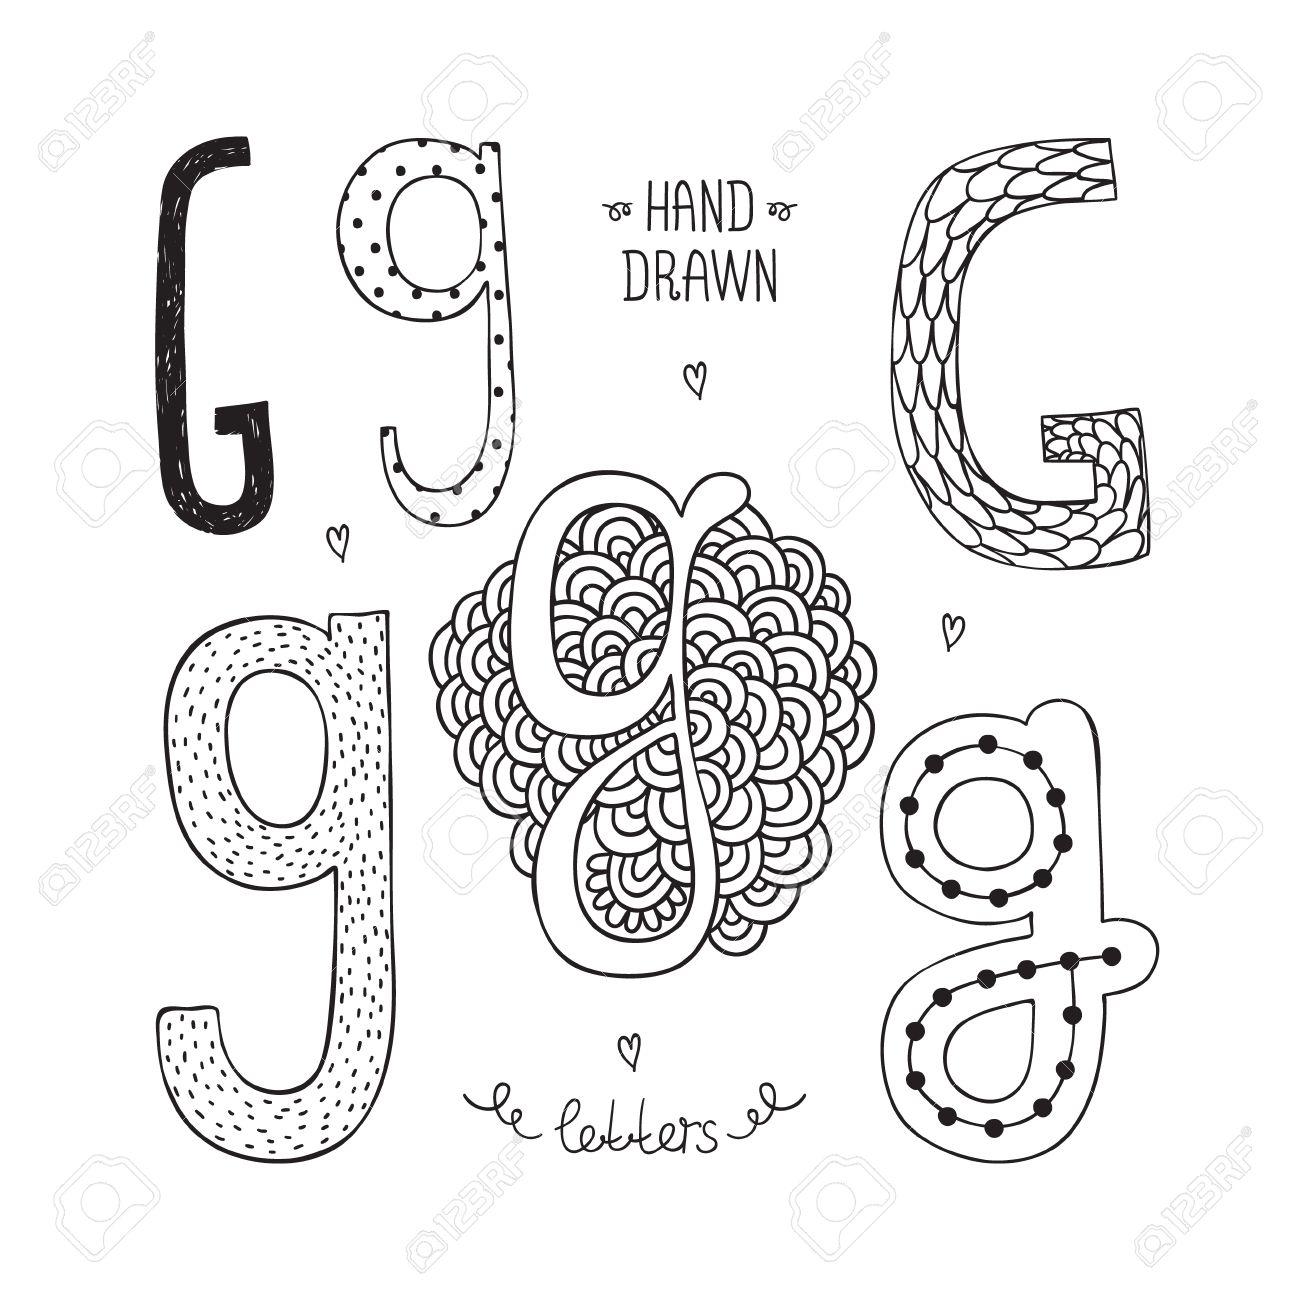 Vector hand drawn alphabet letter g doodle letters set isolated vector vector hand drawn alphabet letter g doodle letters set isolated on white background altavistaventures Gallery